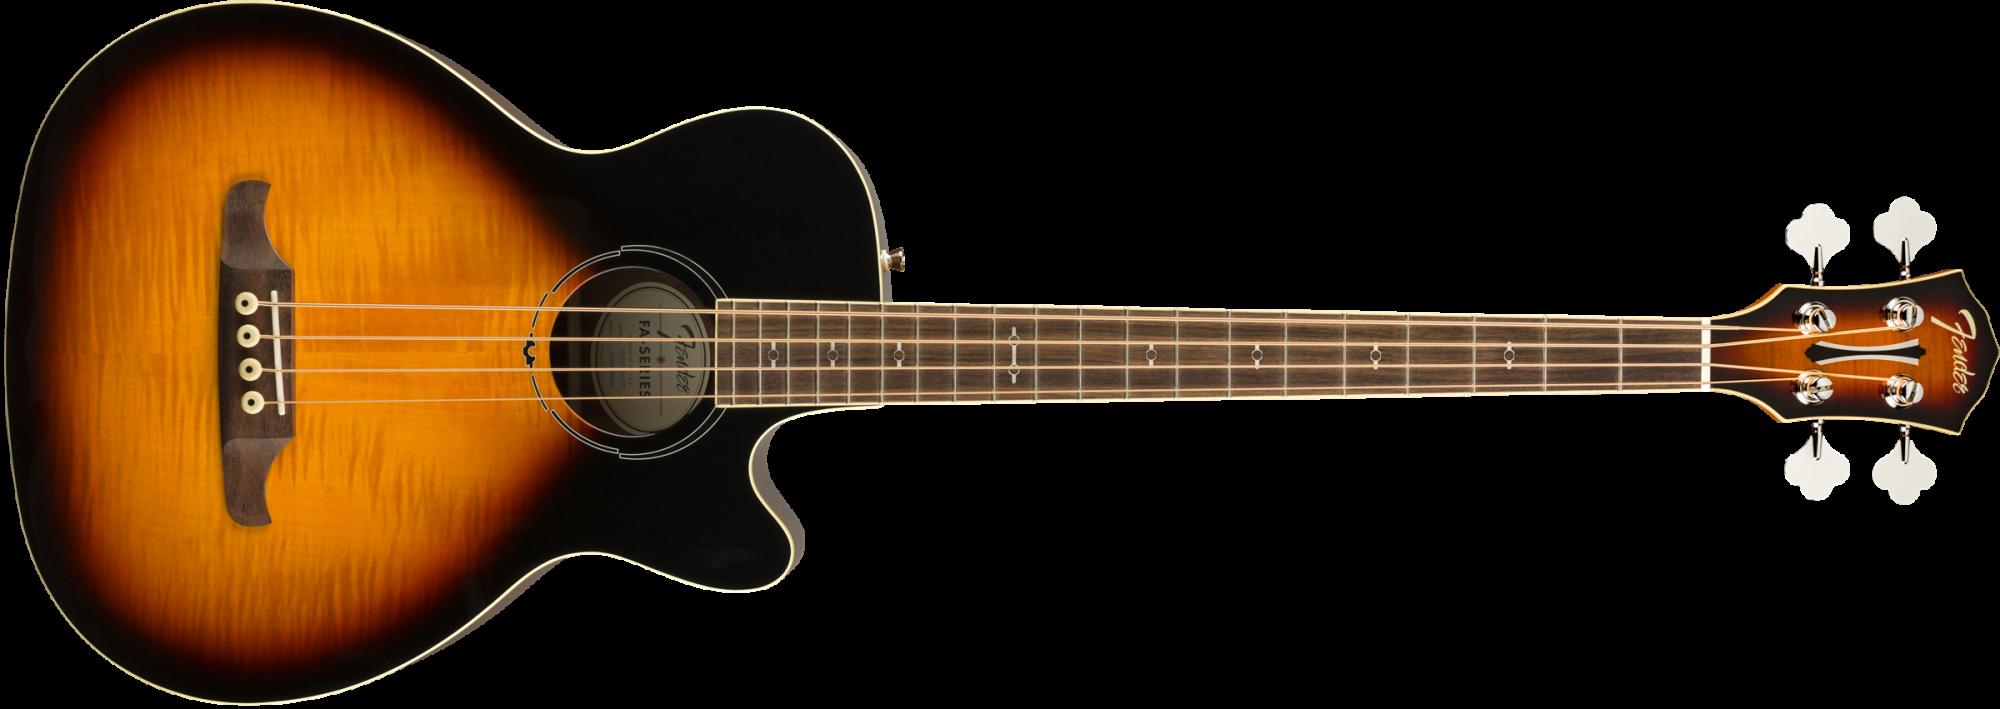 Fender FA-450CE Bass, Laurel Fingerboard